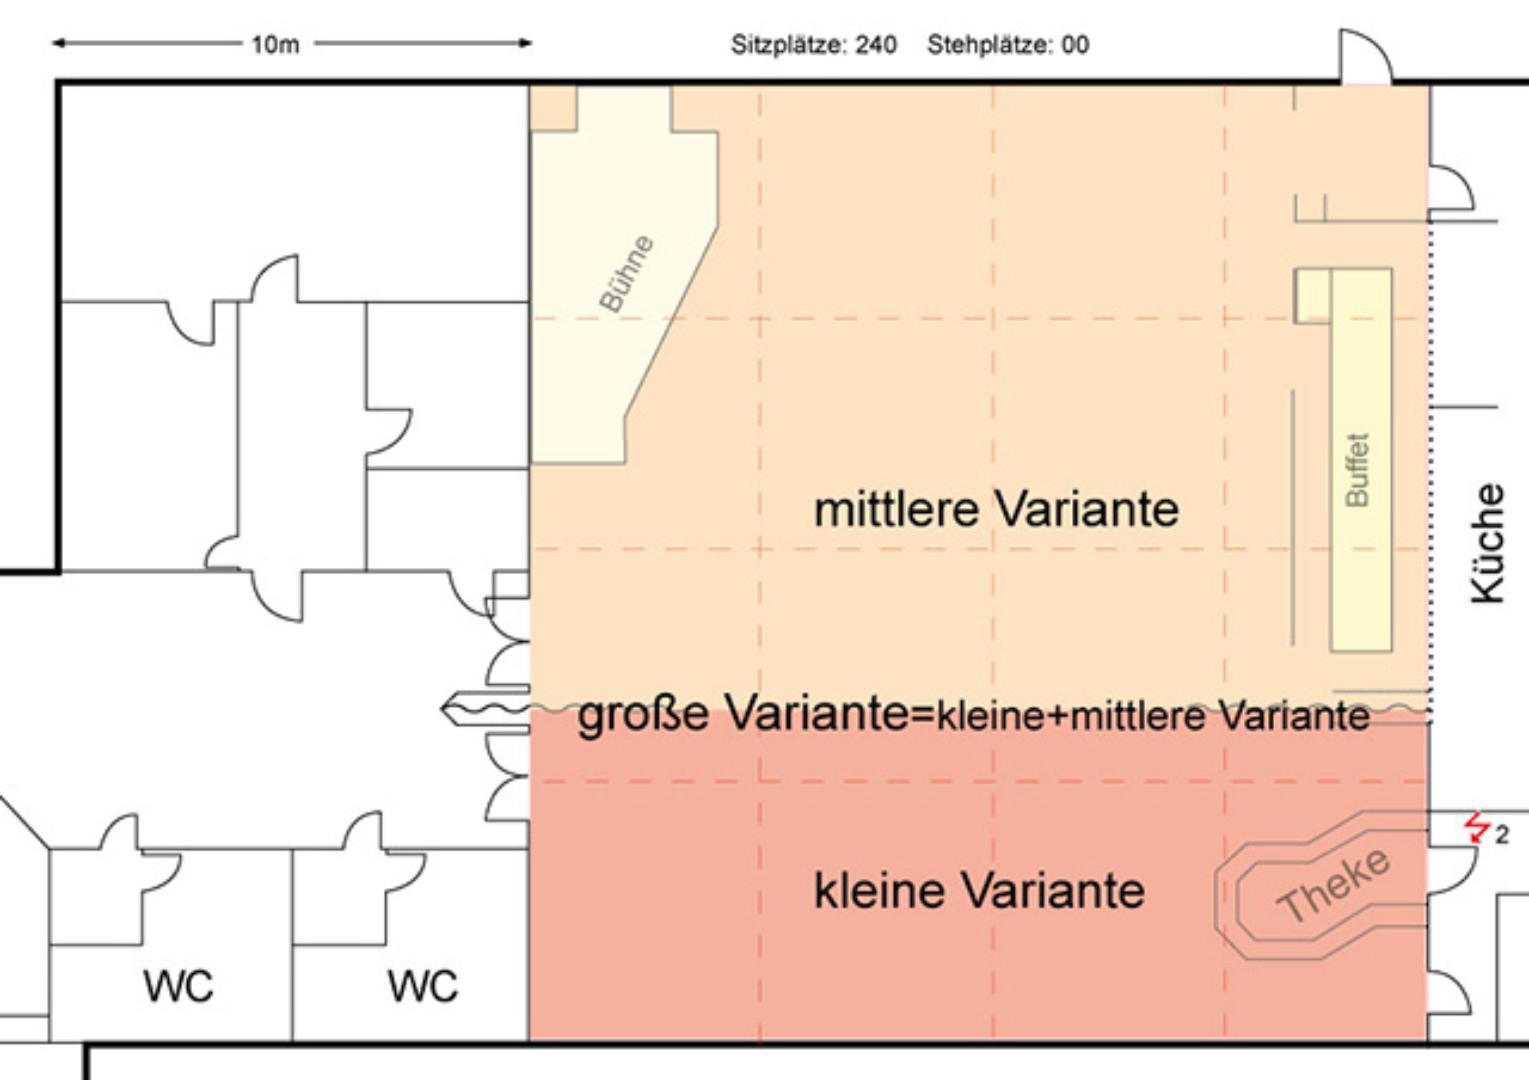 Picture 1 of PODIUM Eventlocation - Eventlocation in Leipzig - Firmenevent